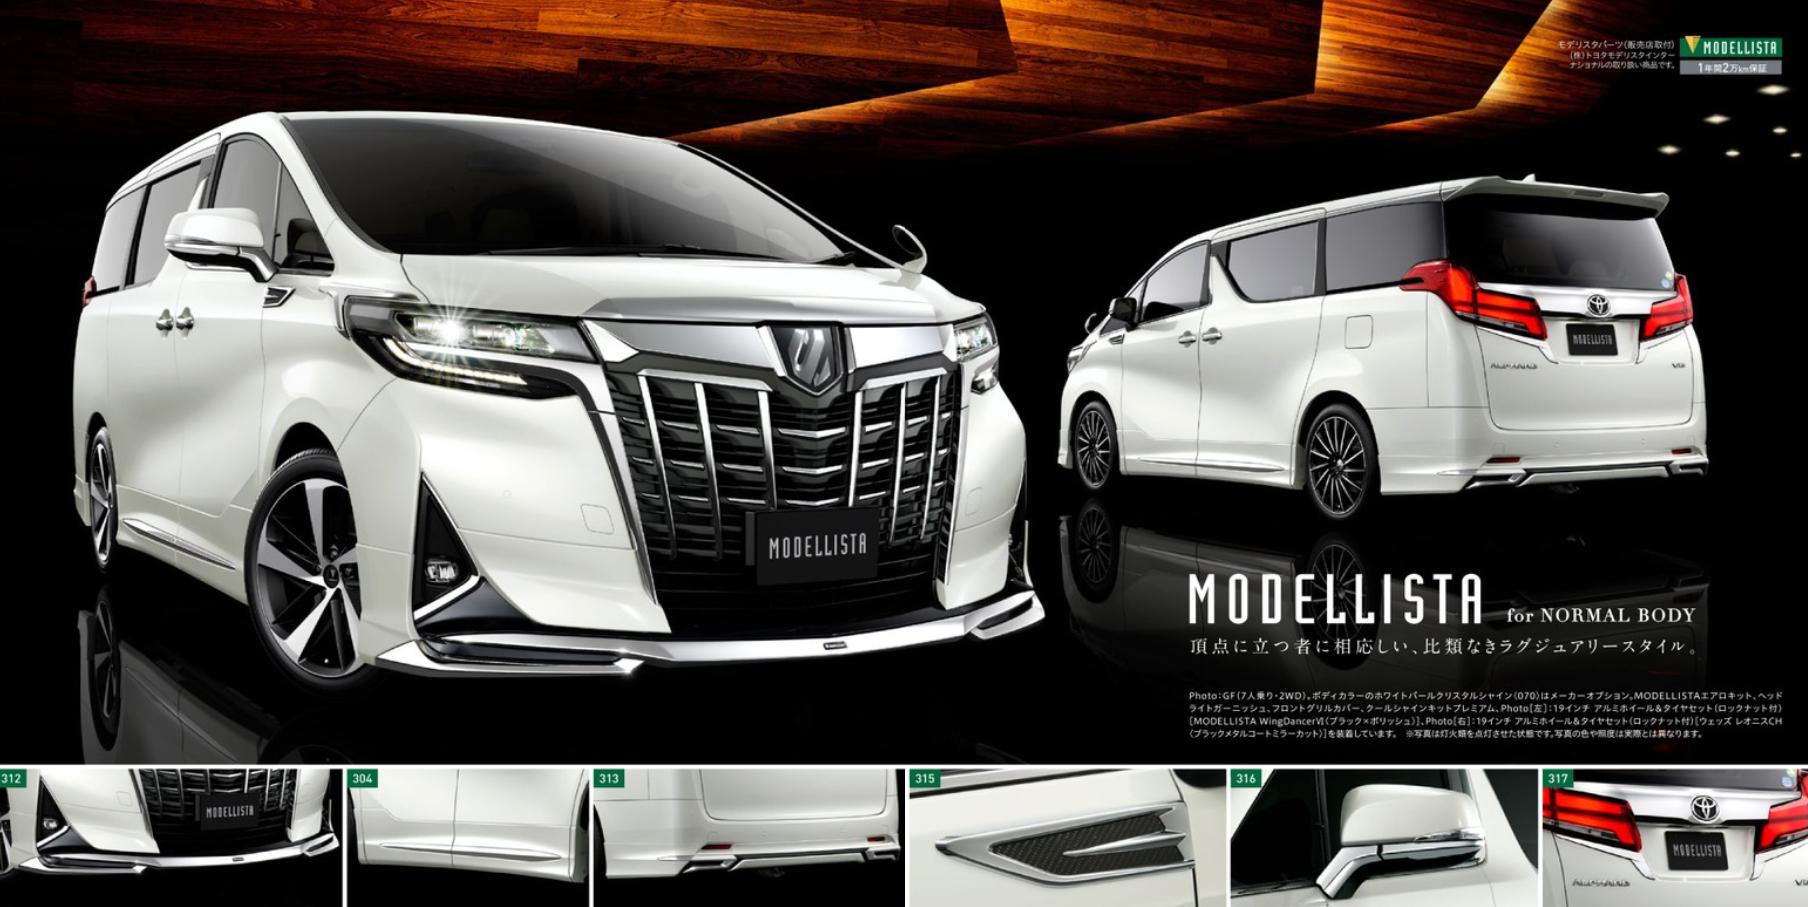 all new toyota vellfire 2018 spesifikasi grand veloz 1.3 alphard  kit modellista trd baru